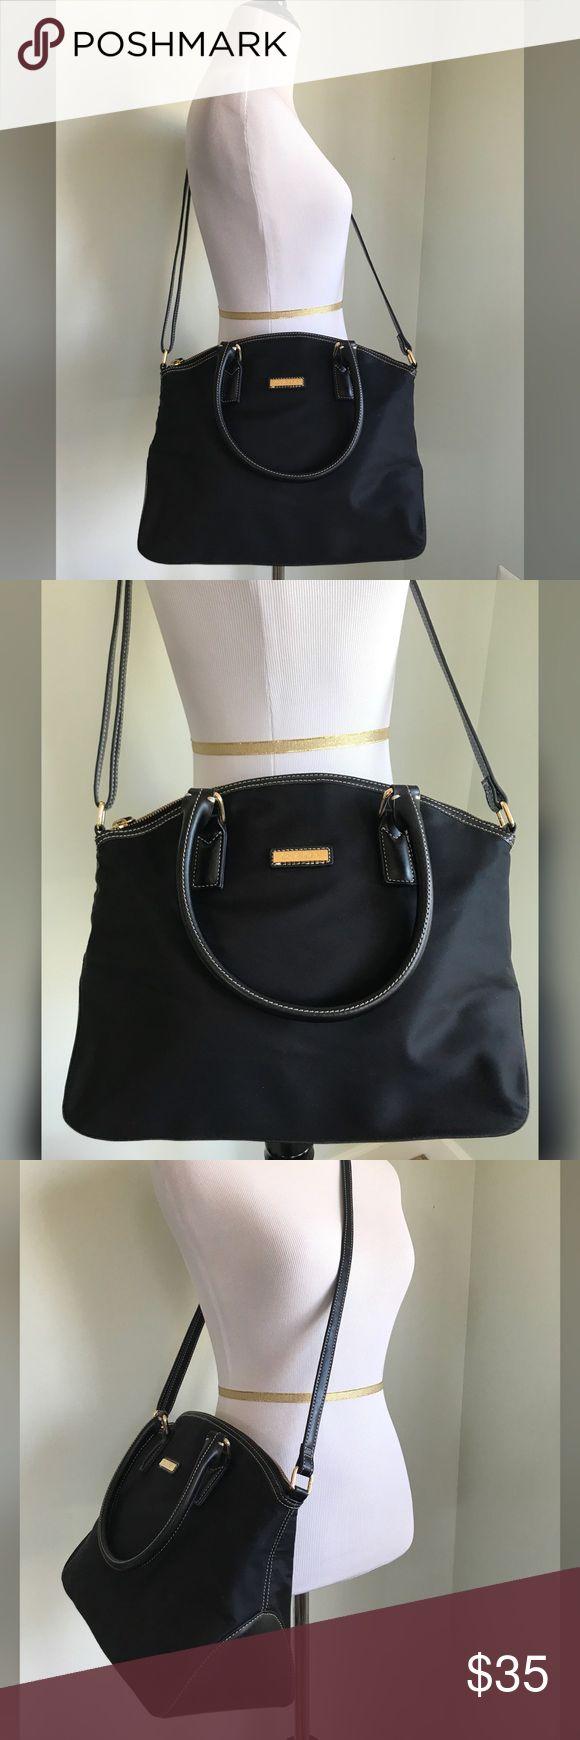 "Calvin Klein Black Crossbody Black crossbody from Calvin Klein.  Gold hardware.  Nylon material.  Black inside fabric with logo.  Inside pockets. EUC. Only wore a couple of times. 18"" strap Length.  10"" height. 5 1/2"" Deep.  13"" Width.  Top zipper. Calvin Klein Bags Crossbody Bags"